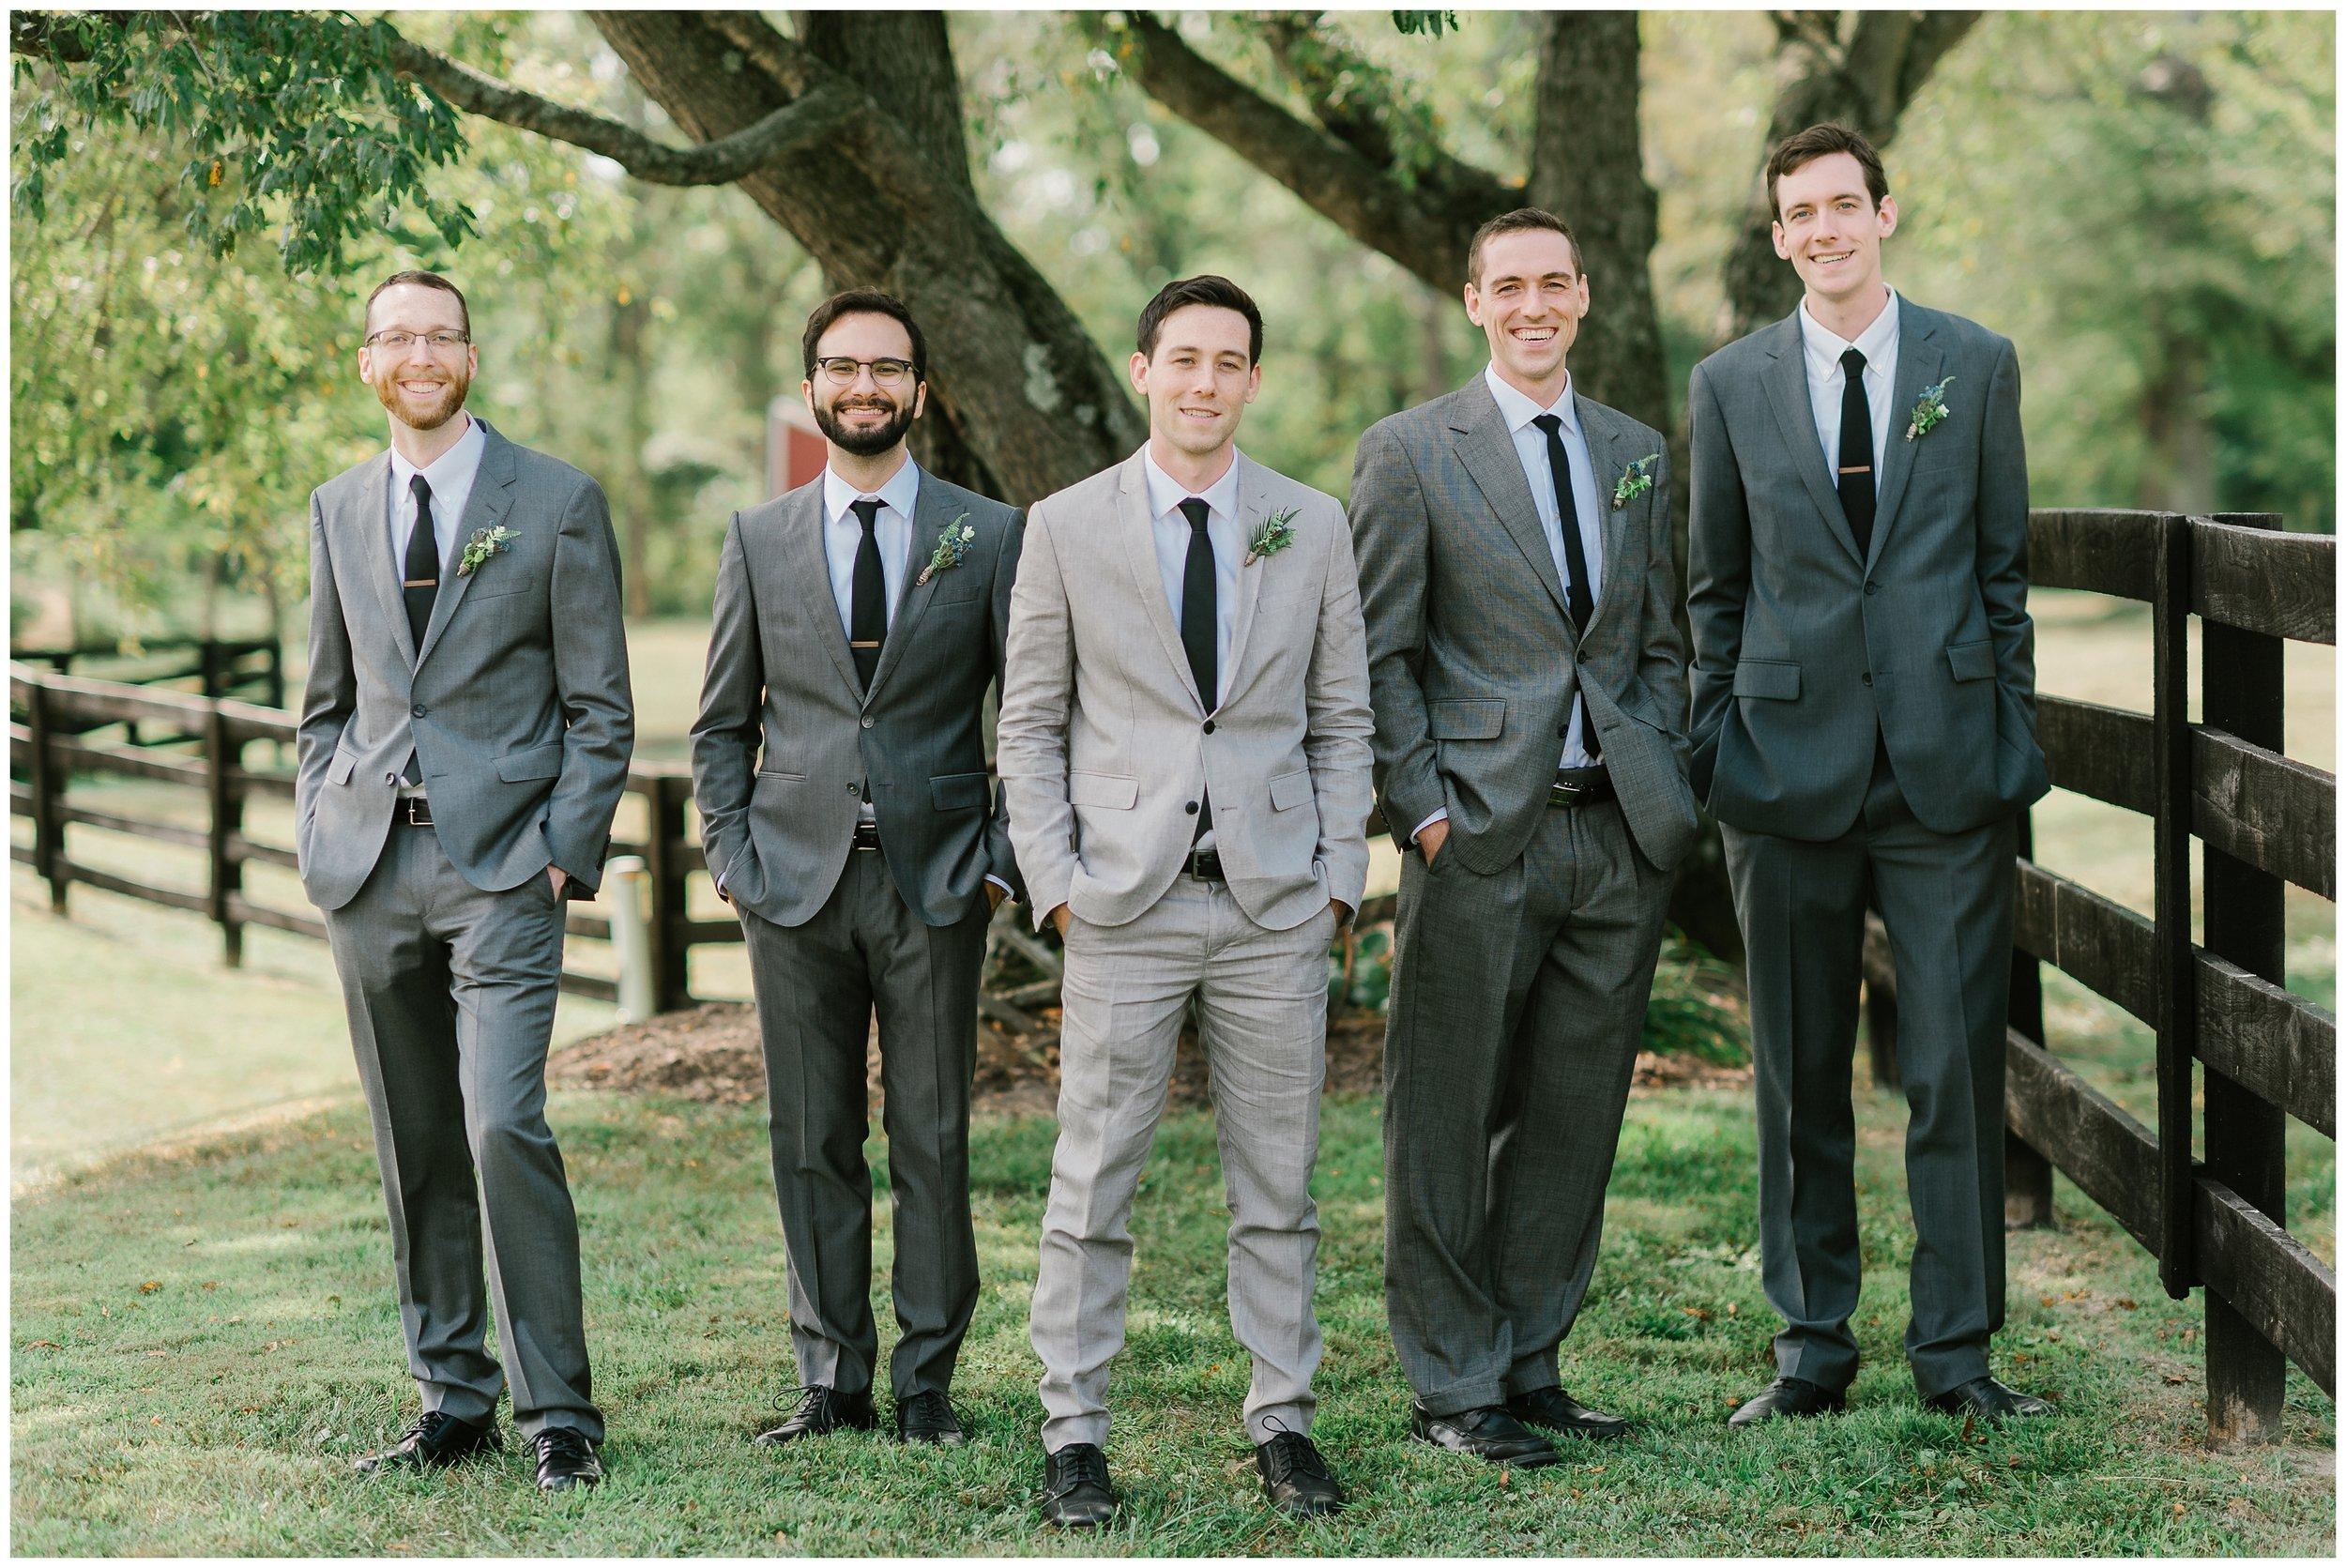 Rebecca_Shehorn_Photography_Indianapolis_Wedding_Photographer_7242.jpg